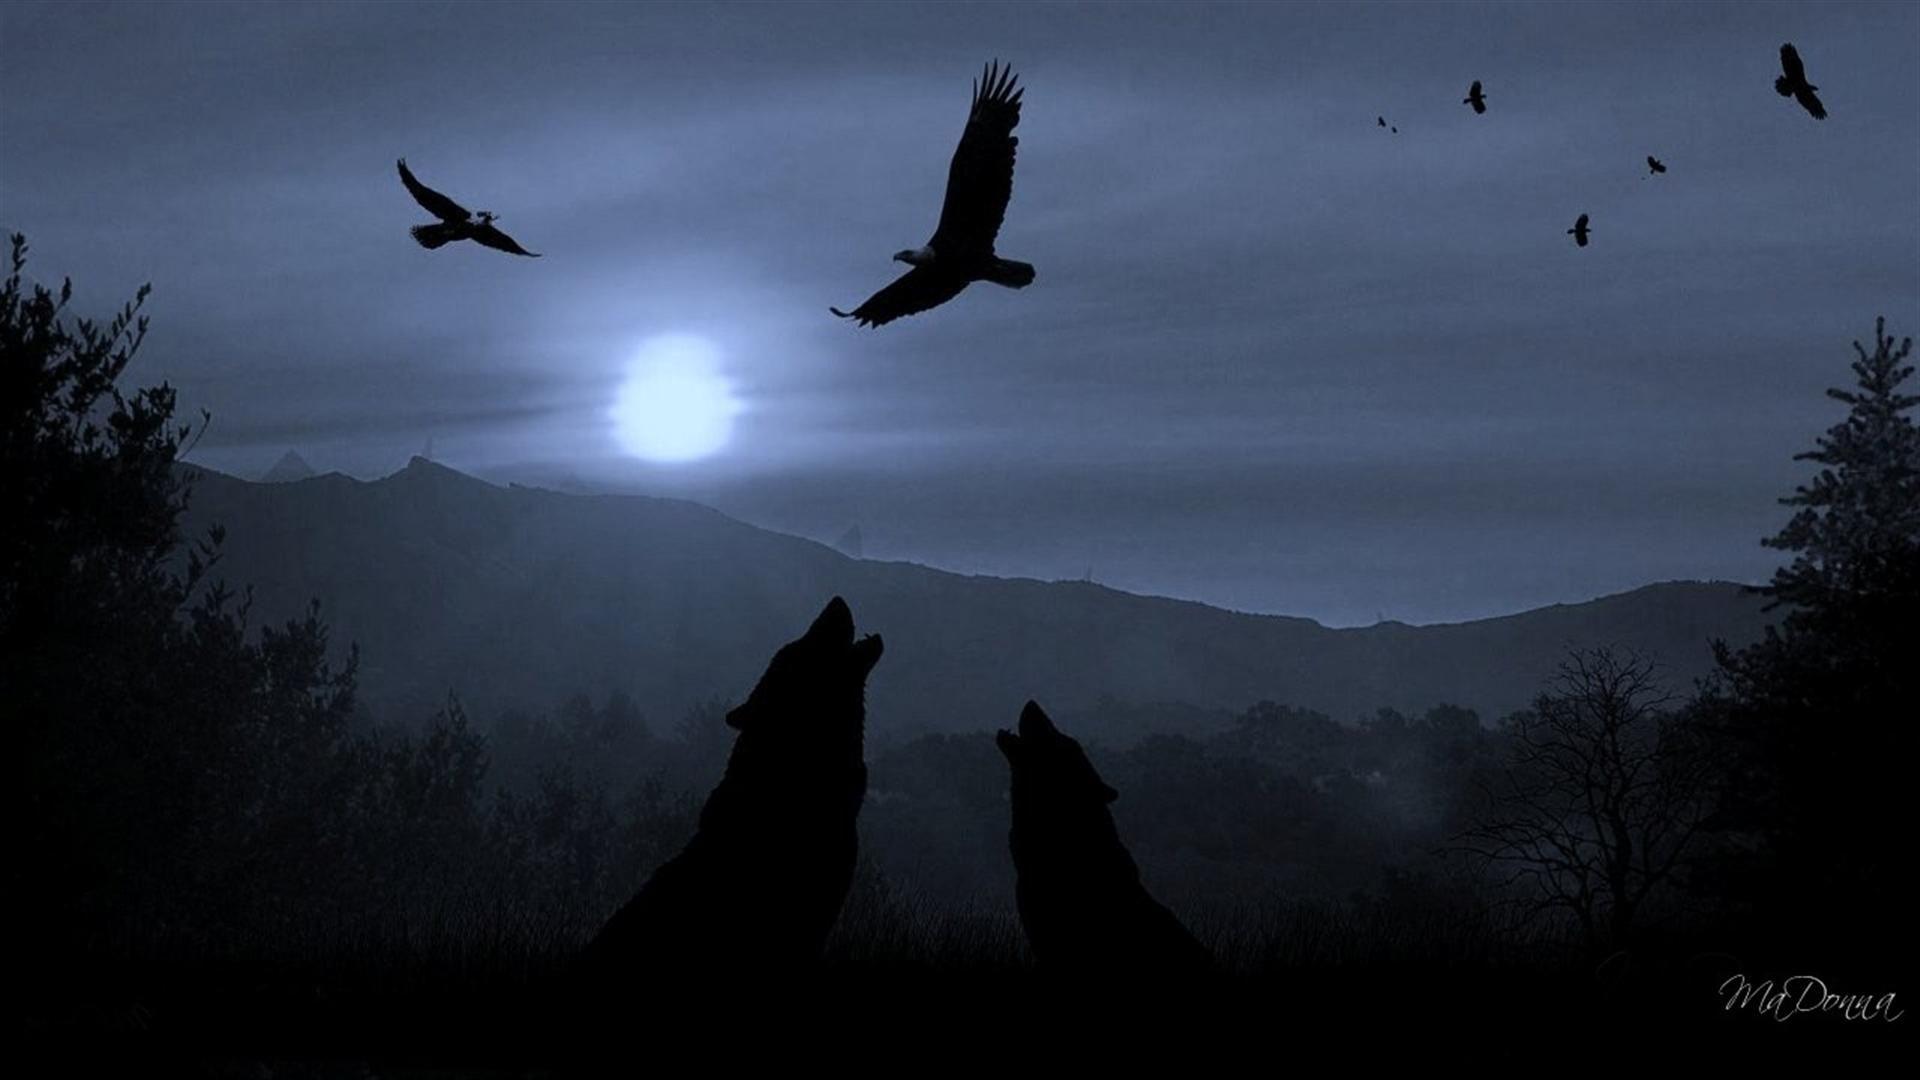 Dark Night Wolves Wallpapers HD Free